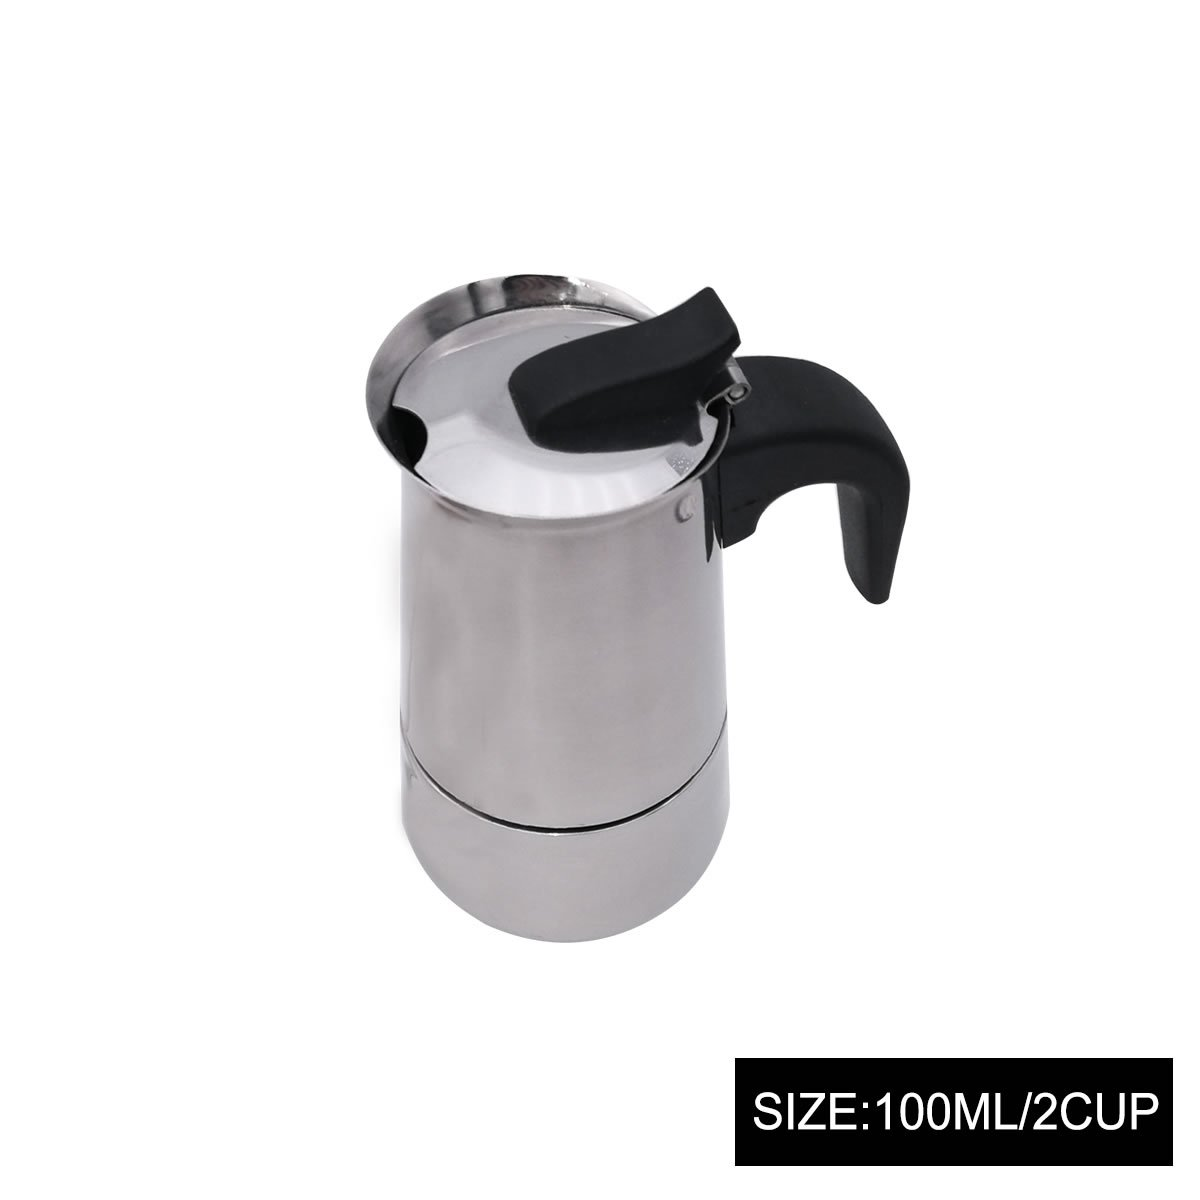 GOODFEER LONGLISHENG 2 Cup Stainless Steel Mocha Pot Detachable Design Aluminum Alloy Coffee Maker